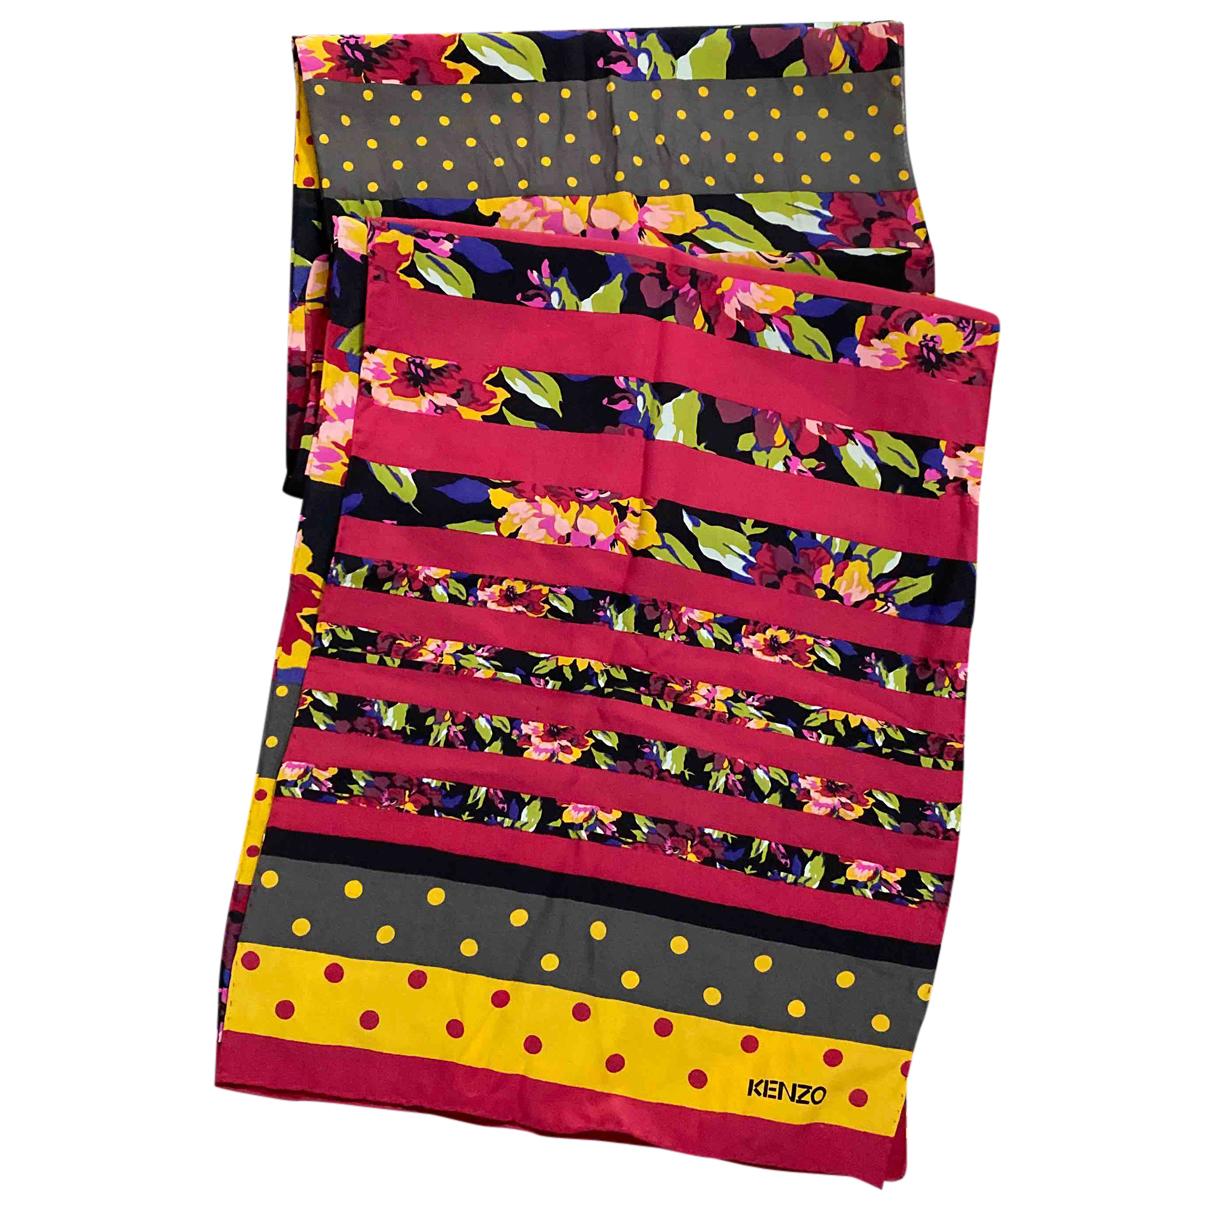 Kenzo - Foulard   pour femme en soie